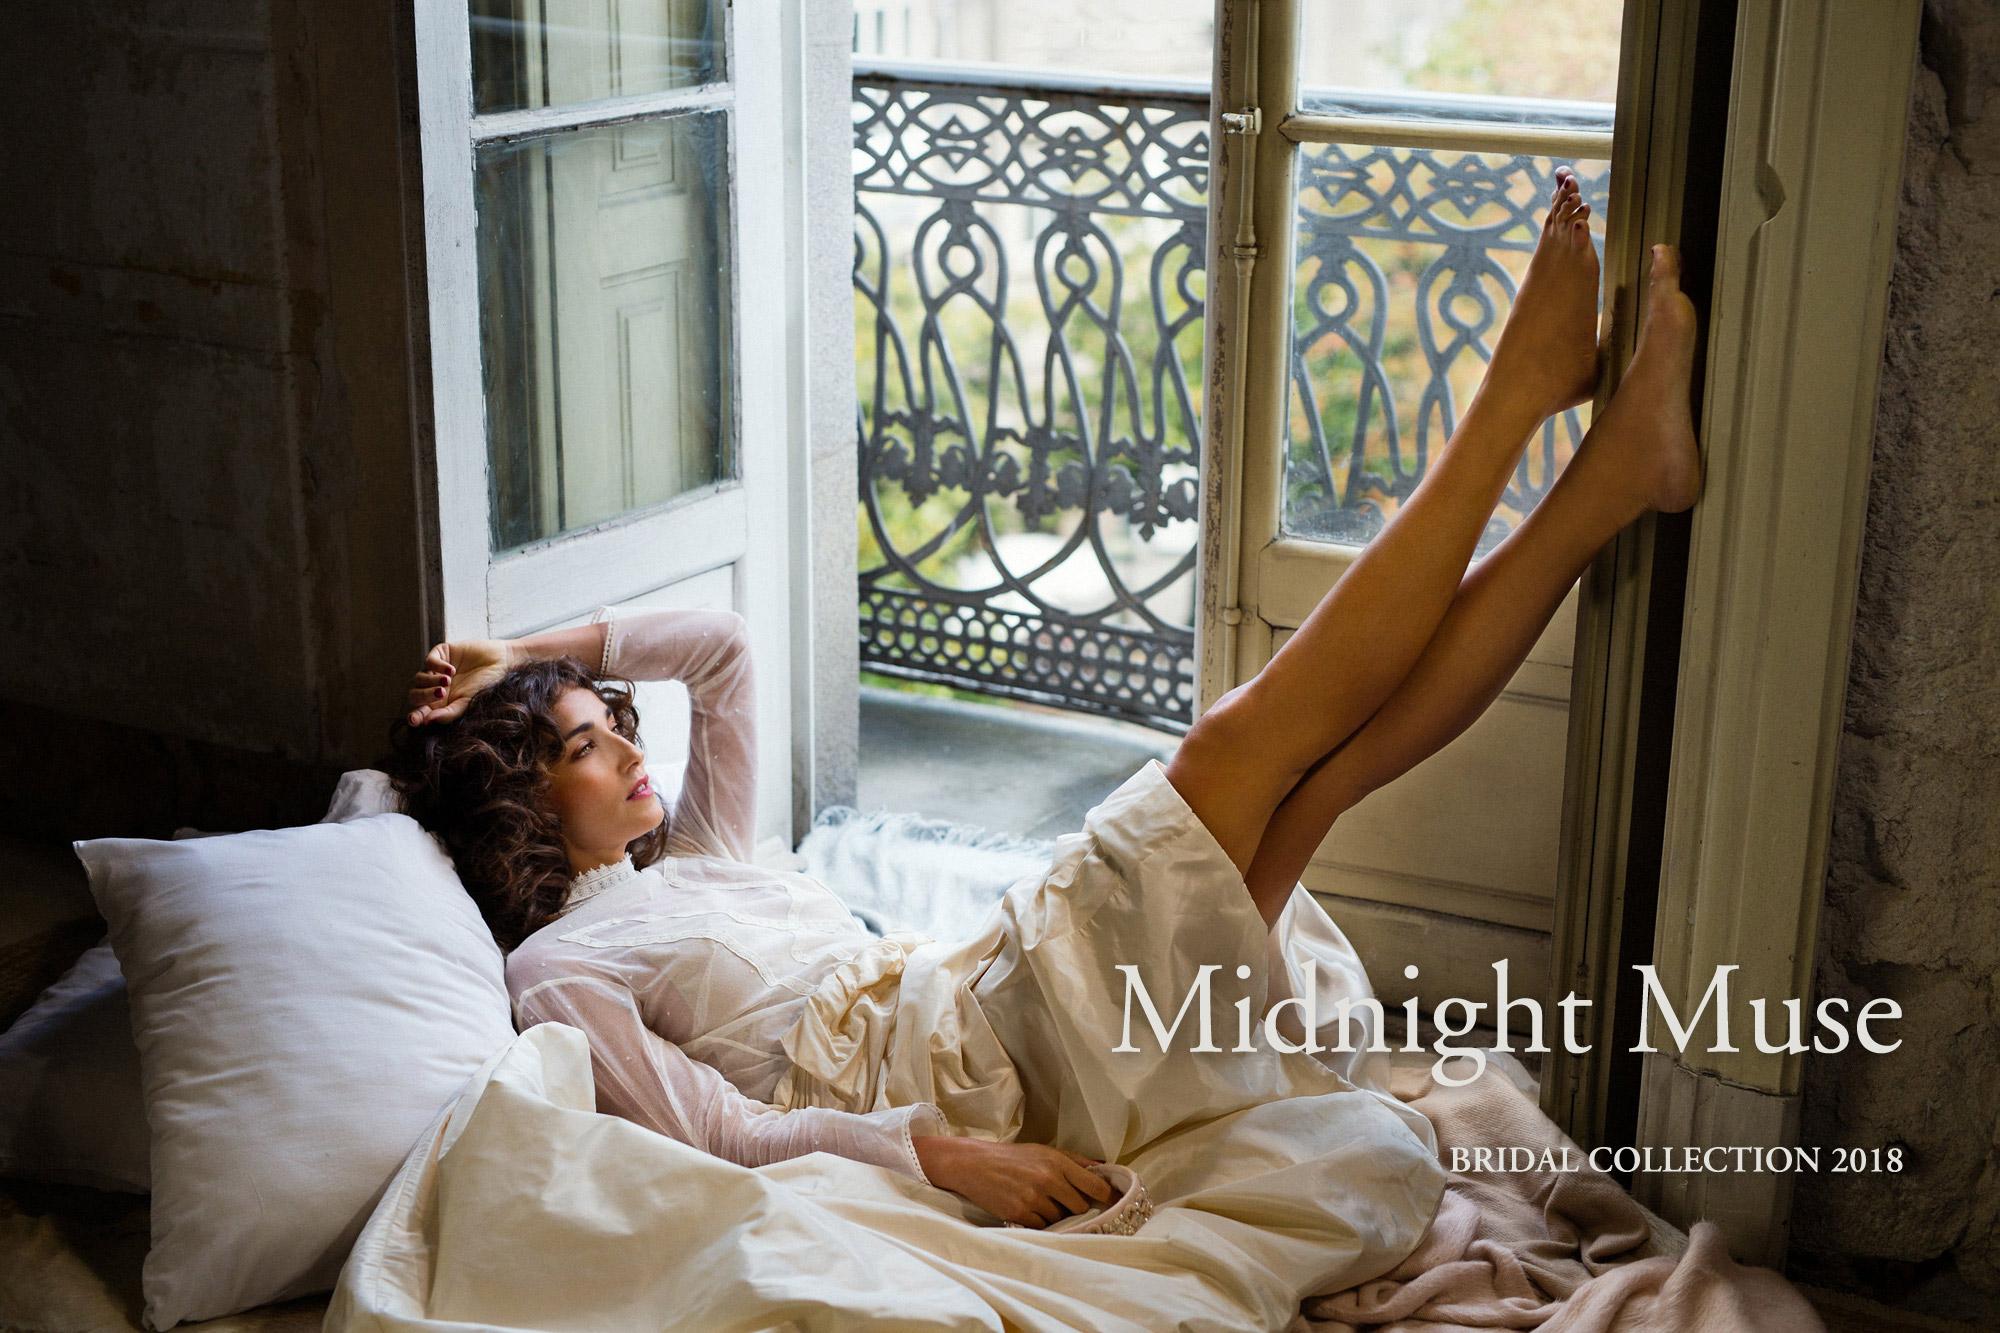 Campaña Midnight Muse 2018